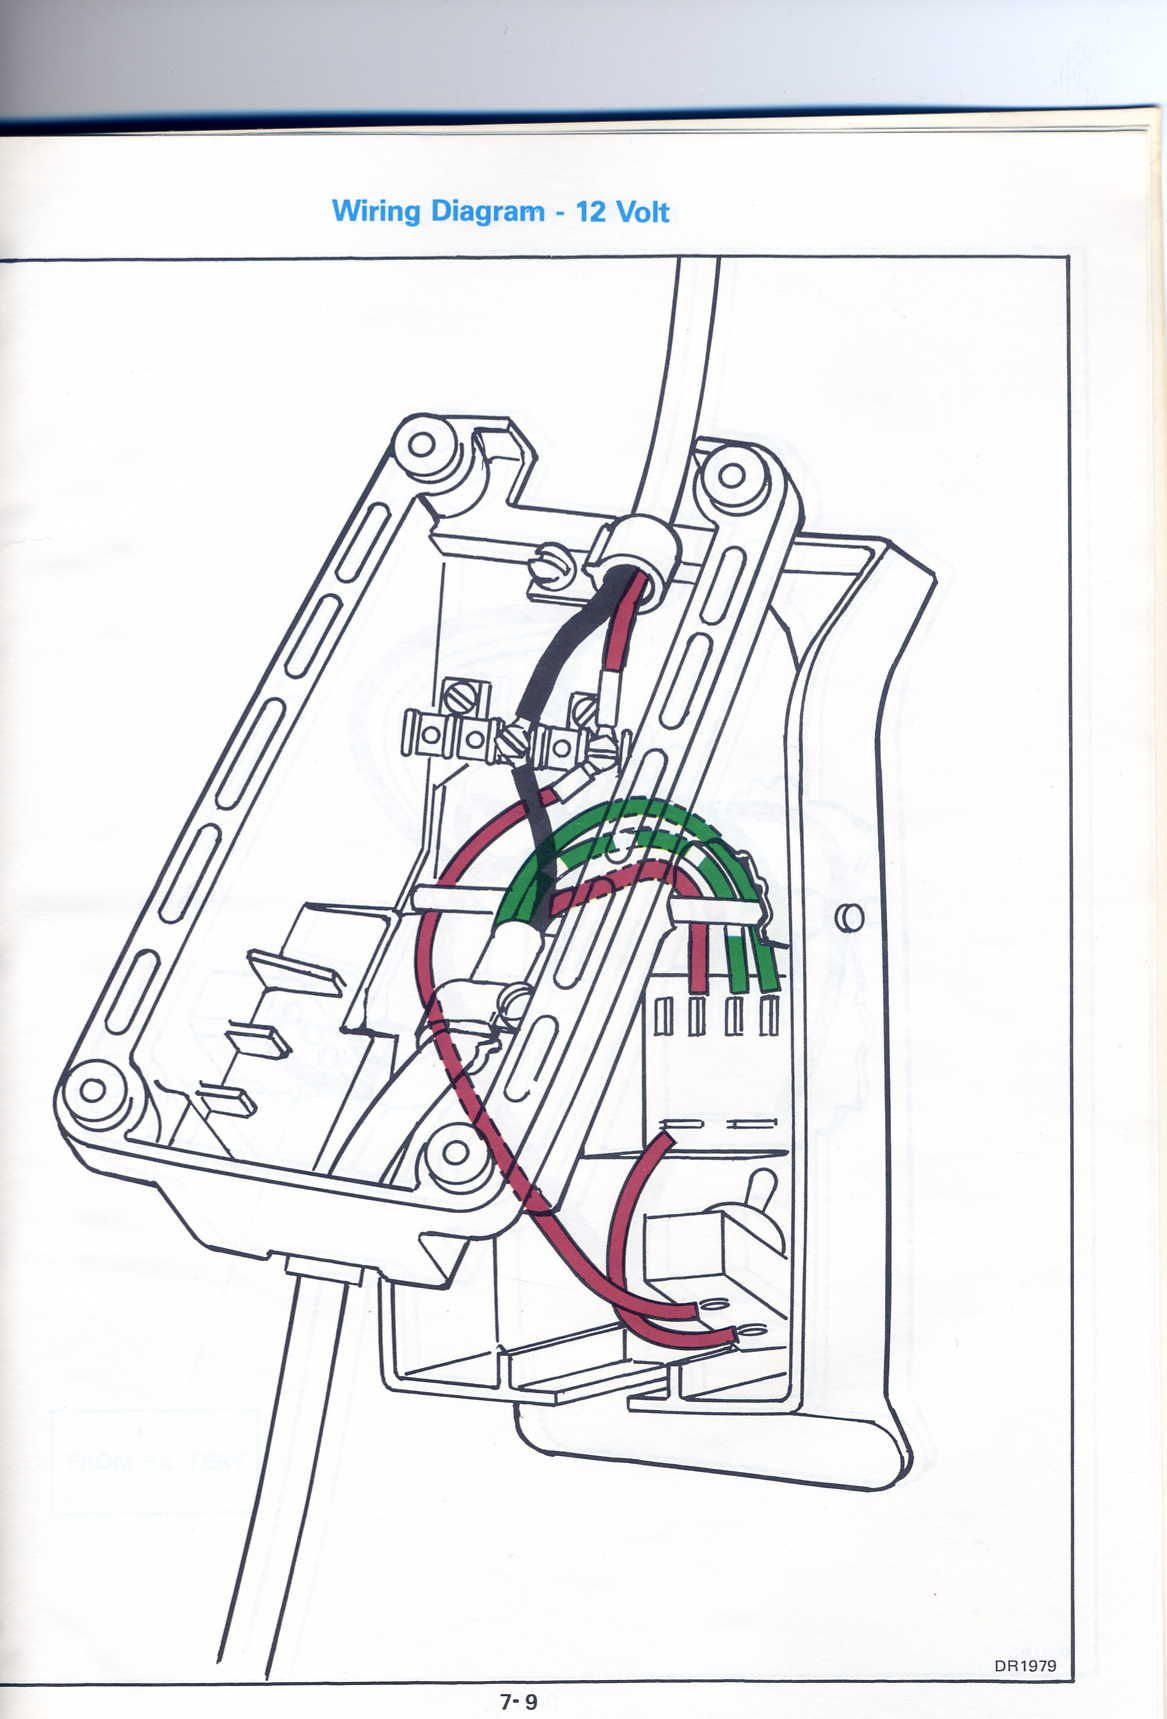 small resolution of motorguide trolling motor wiring diagram trying to repair a friendstrolling motor foot pedel wiring diagram